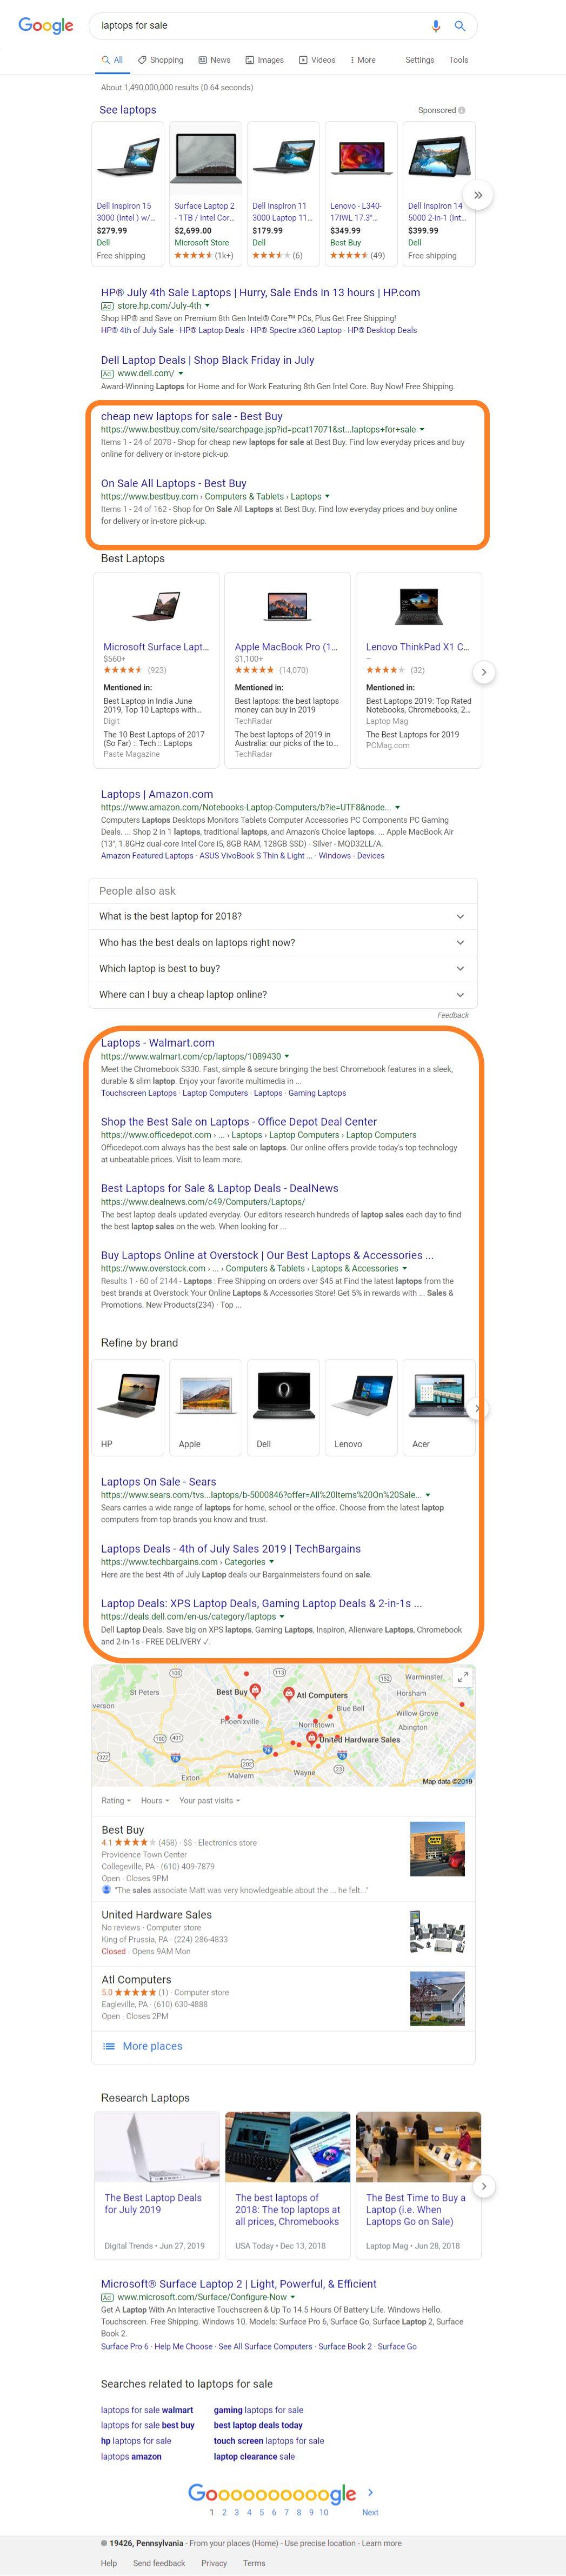 ecommerce seo serp google